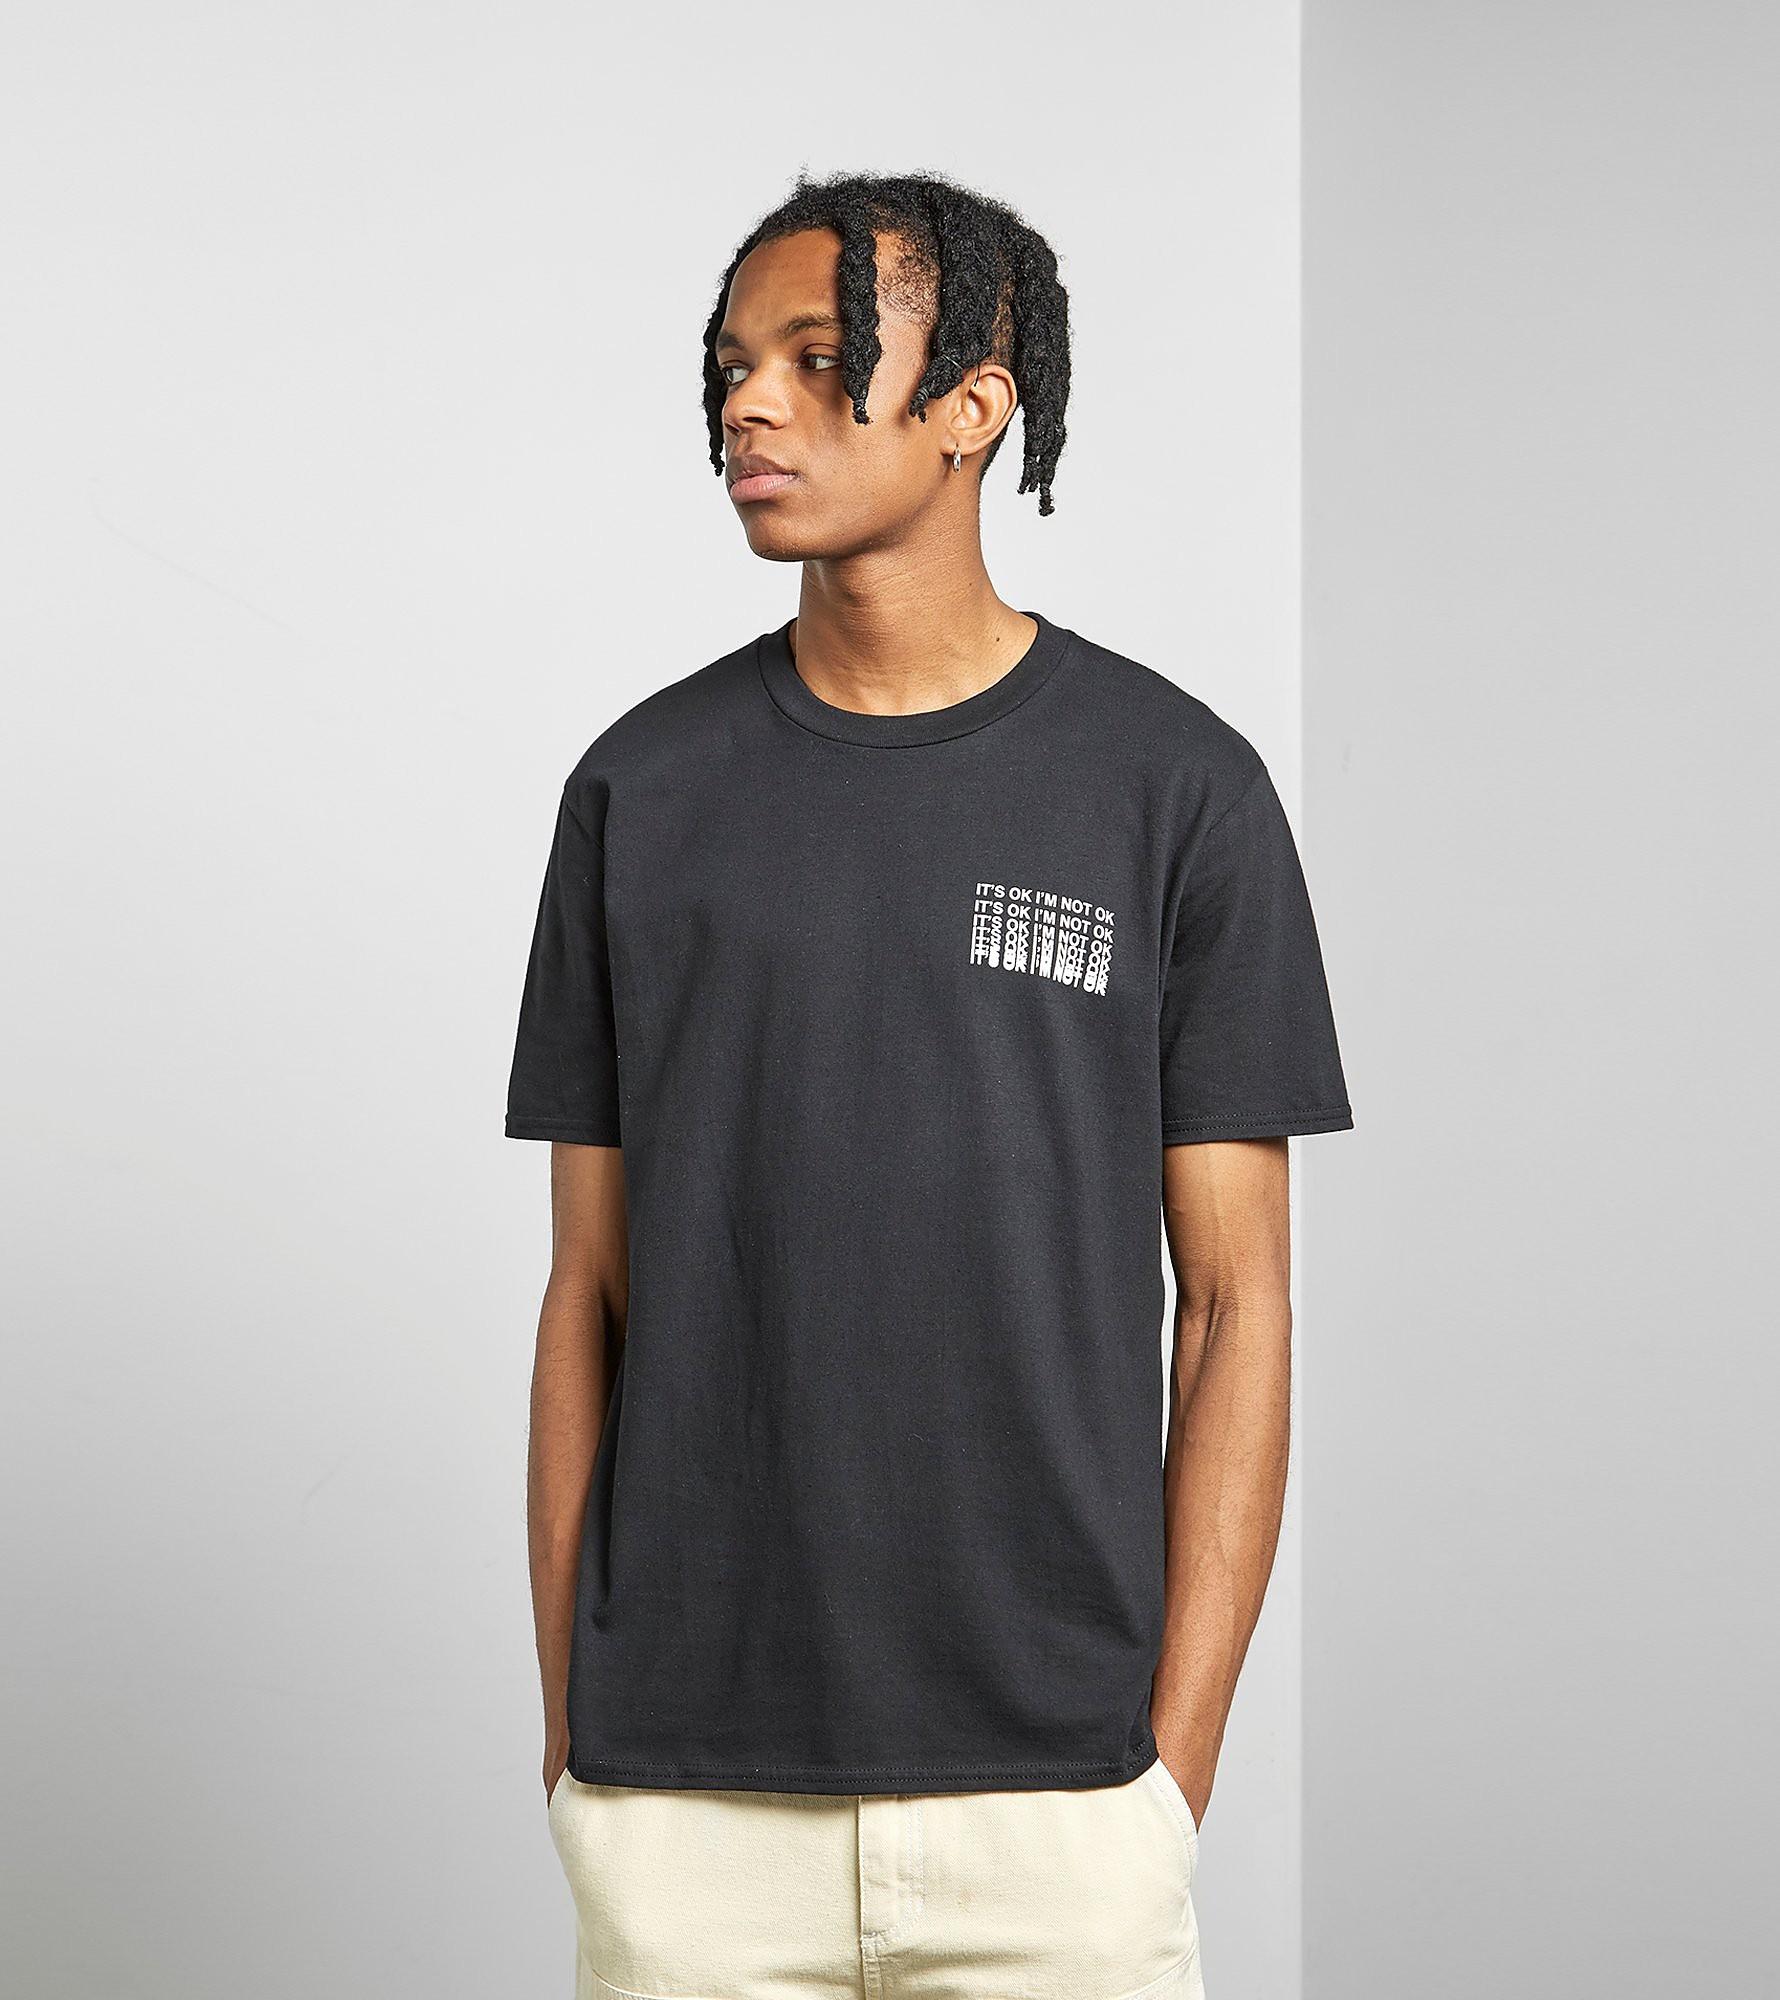 indcsn It's OK T-Shirt